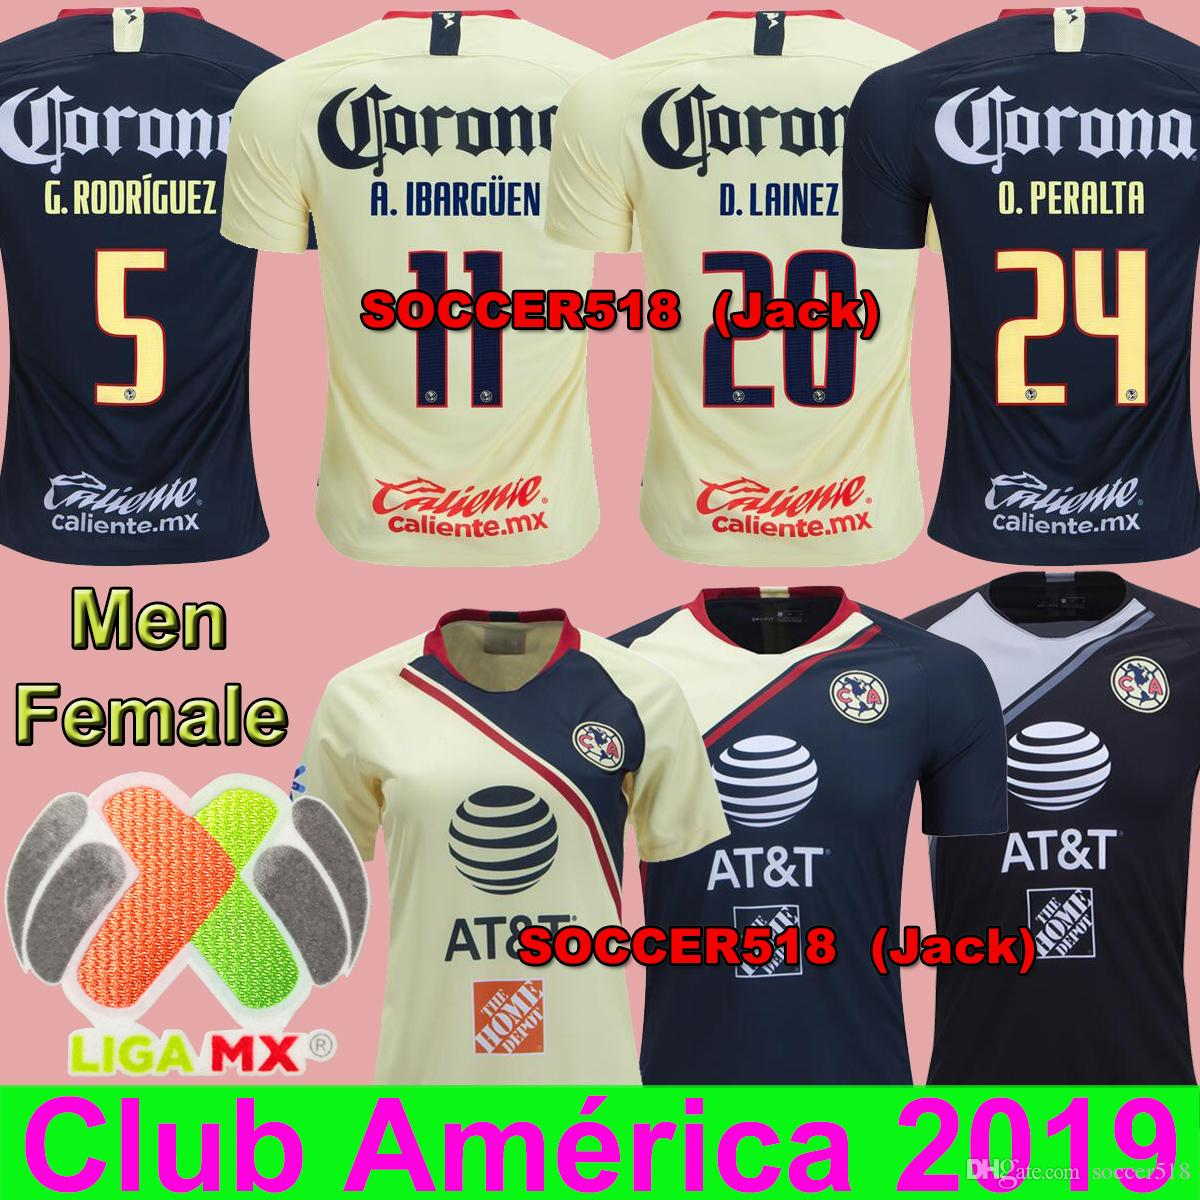 O.PERALTA   24 Club America 2018 2019 Goalkeer Negro IBARGÜEN SAMBUEZA D.  LAINEZ Camiseta De Fútbol Casa Amarilla P. AGUILAR Mexicana Liga Mx  Femenina Por ... fa64d65e8616c